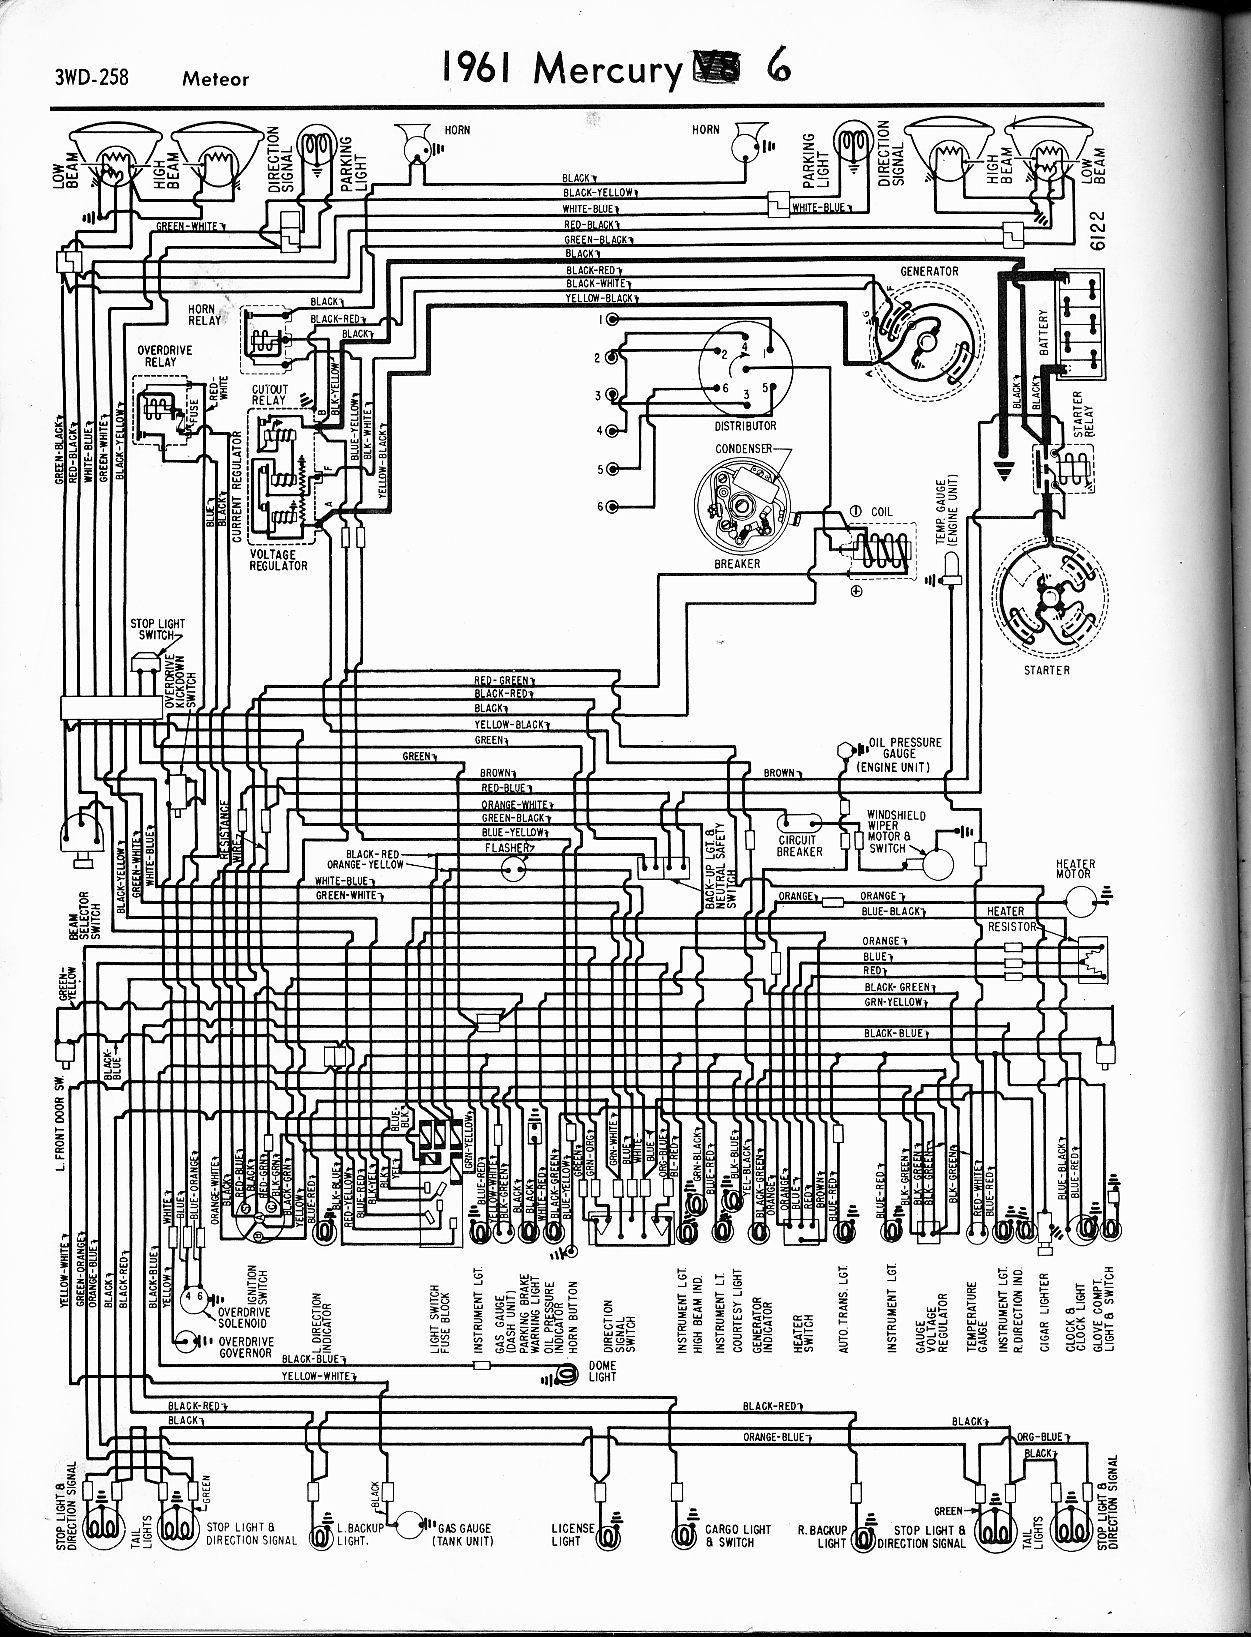 Rl 4050 1954 Mercury Monterey Wiring Diagram Free Diagram